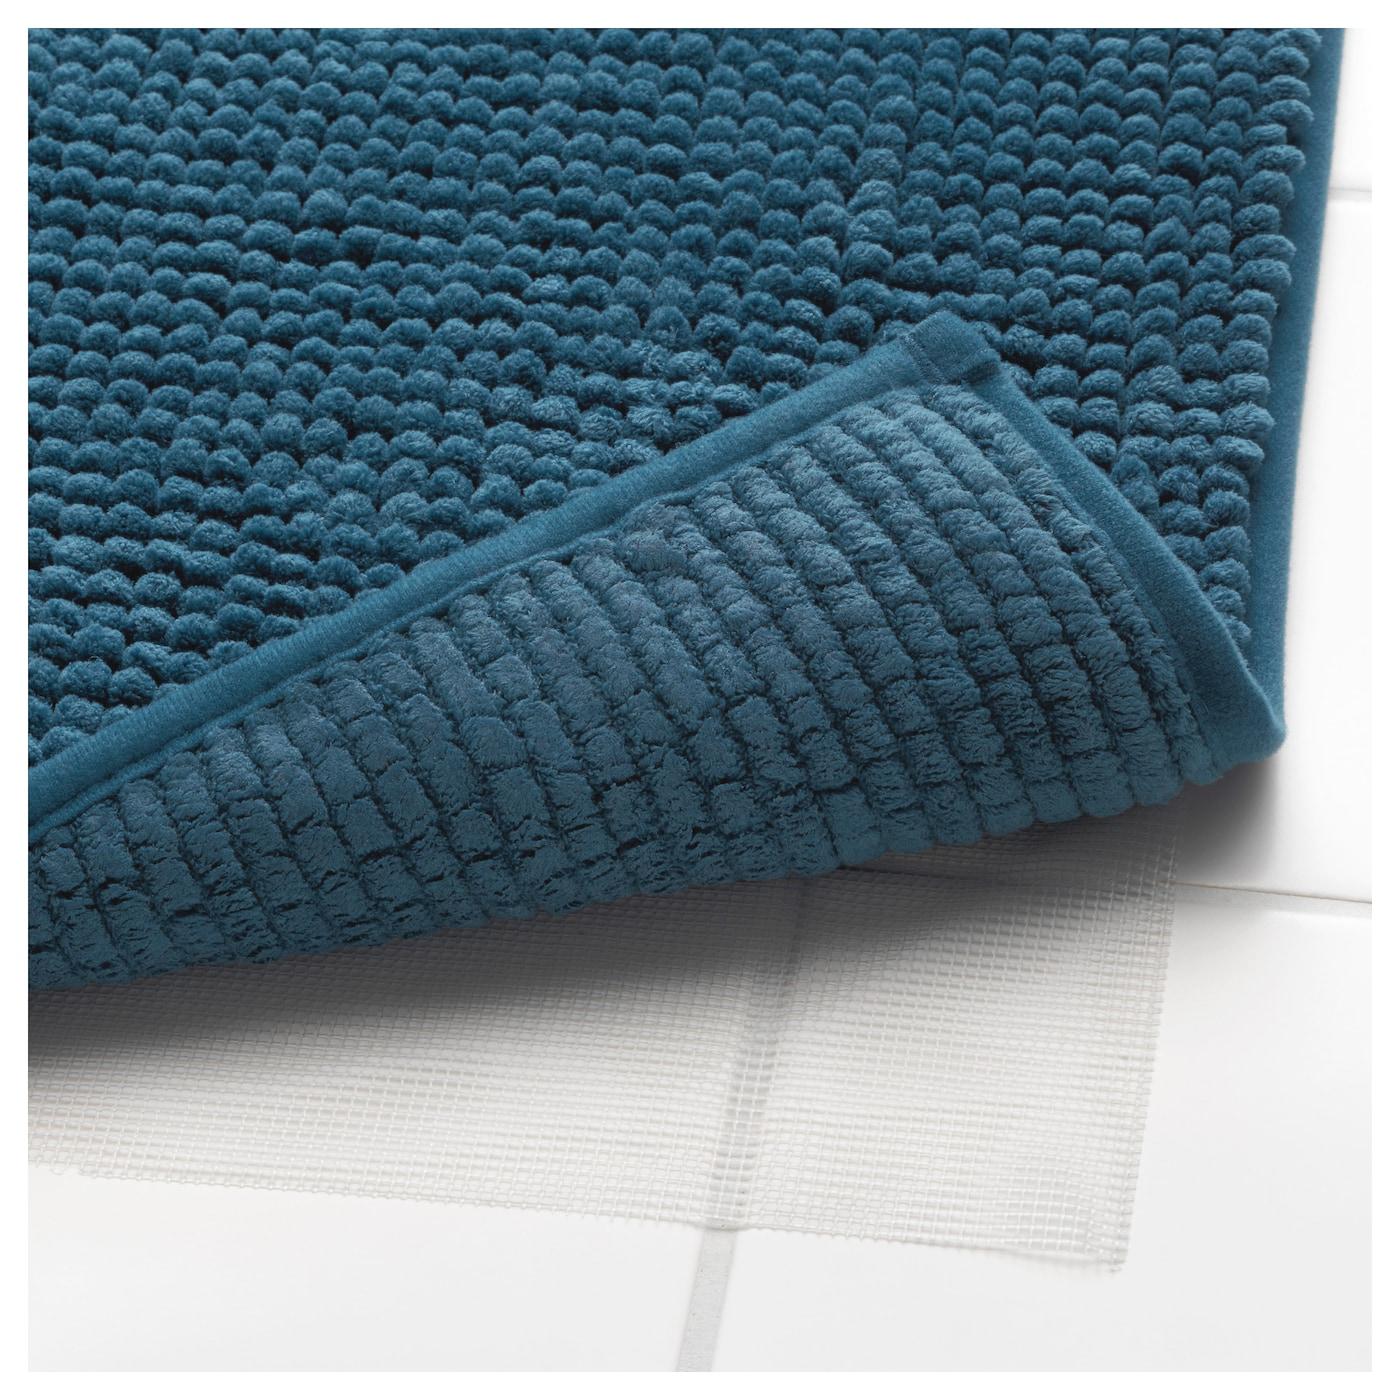 toftbo tapis de bain vert bleu 60 x 90 cm ikea. Black Bedroom Furniture Sets. Home Design Ideas